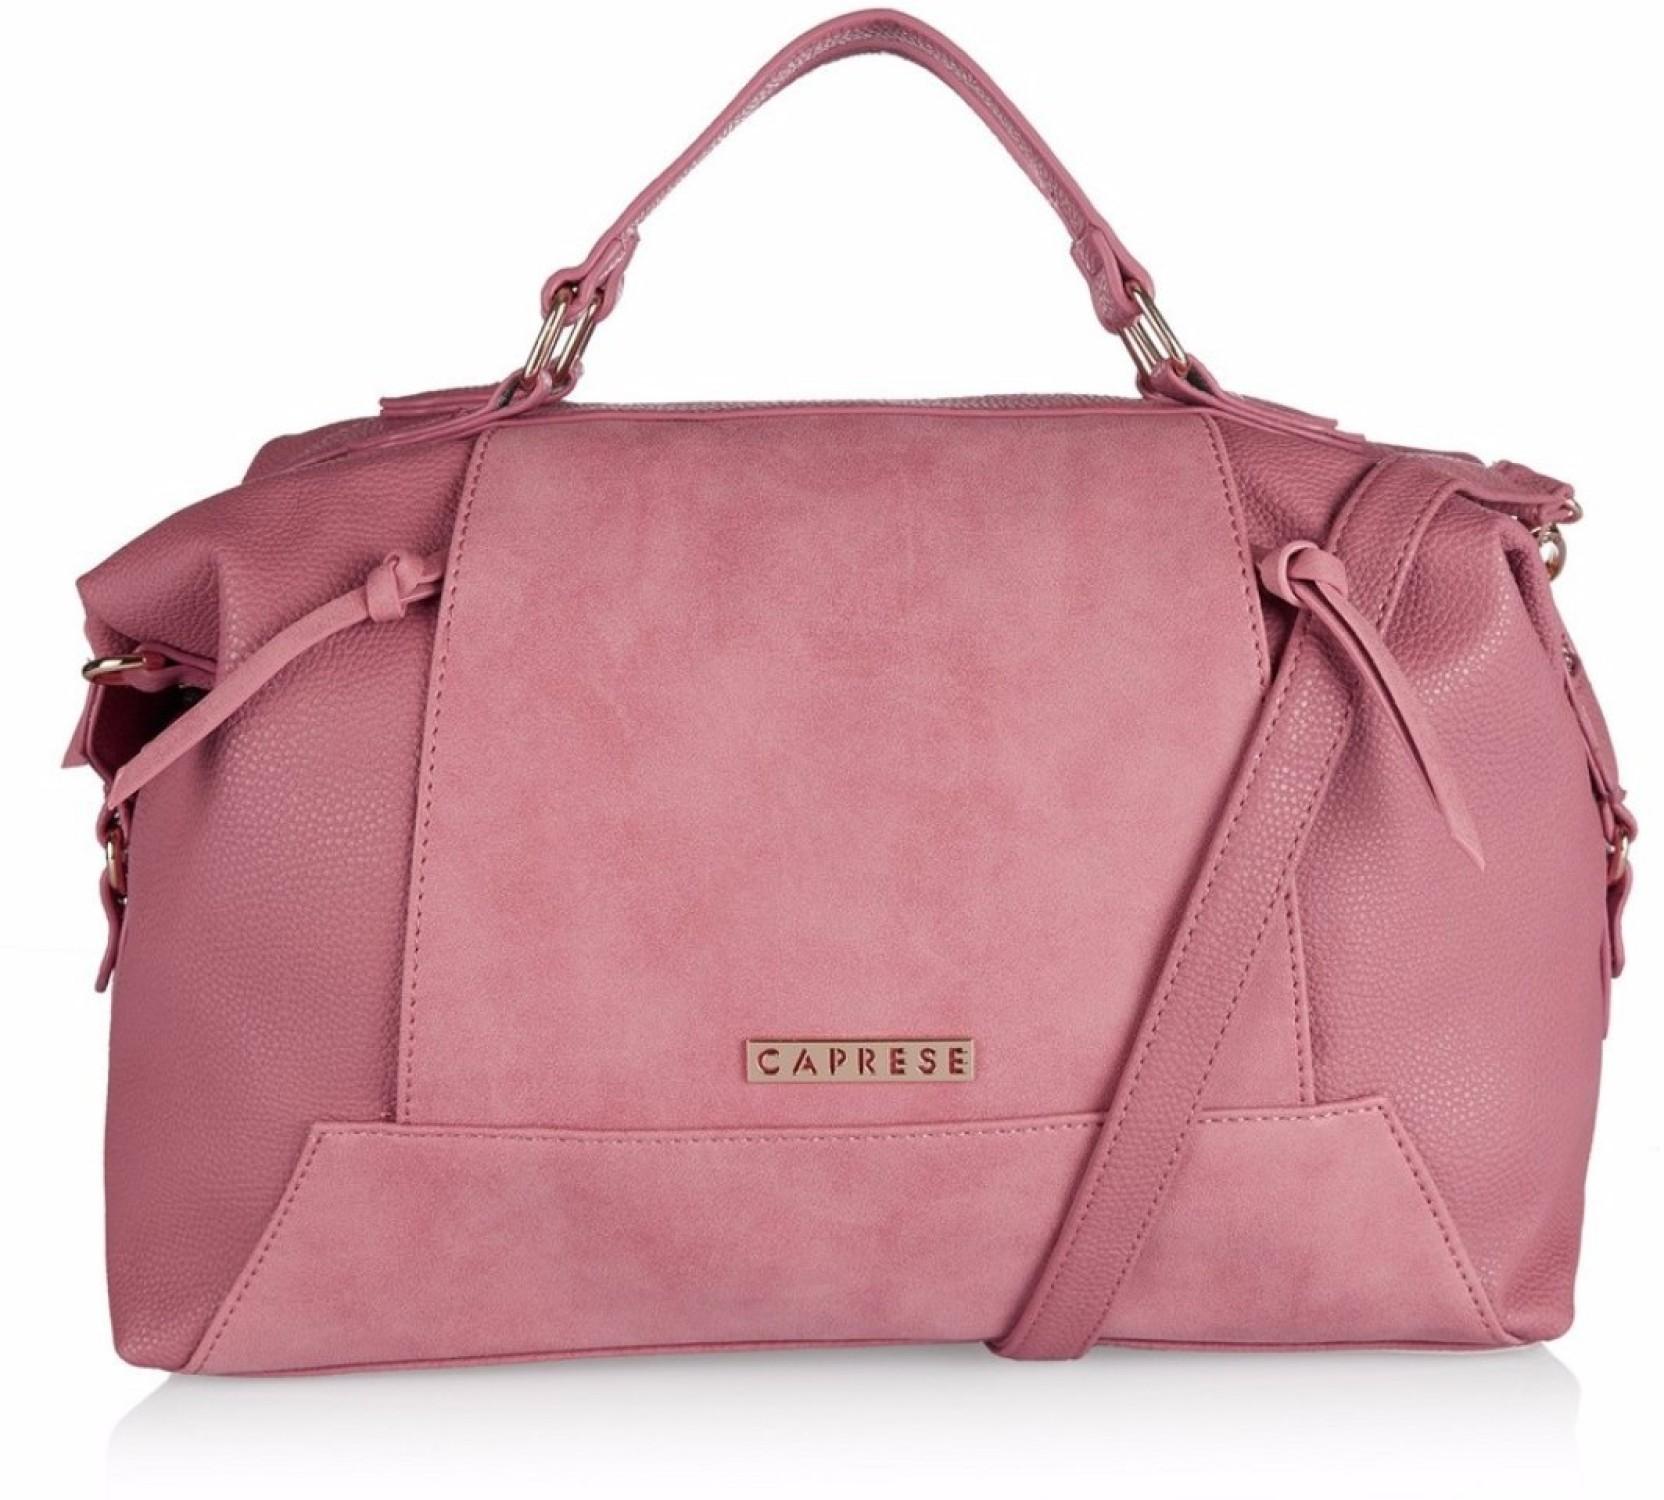 54ced8129ef Branded Handbags Online Caprese